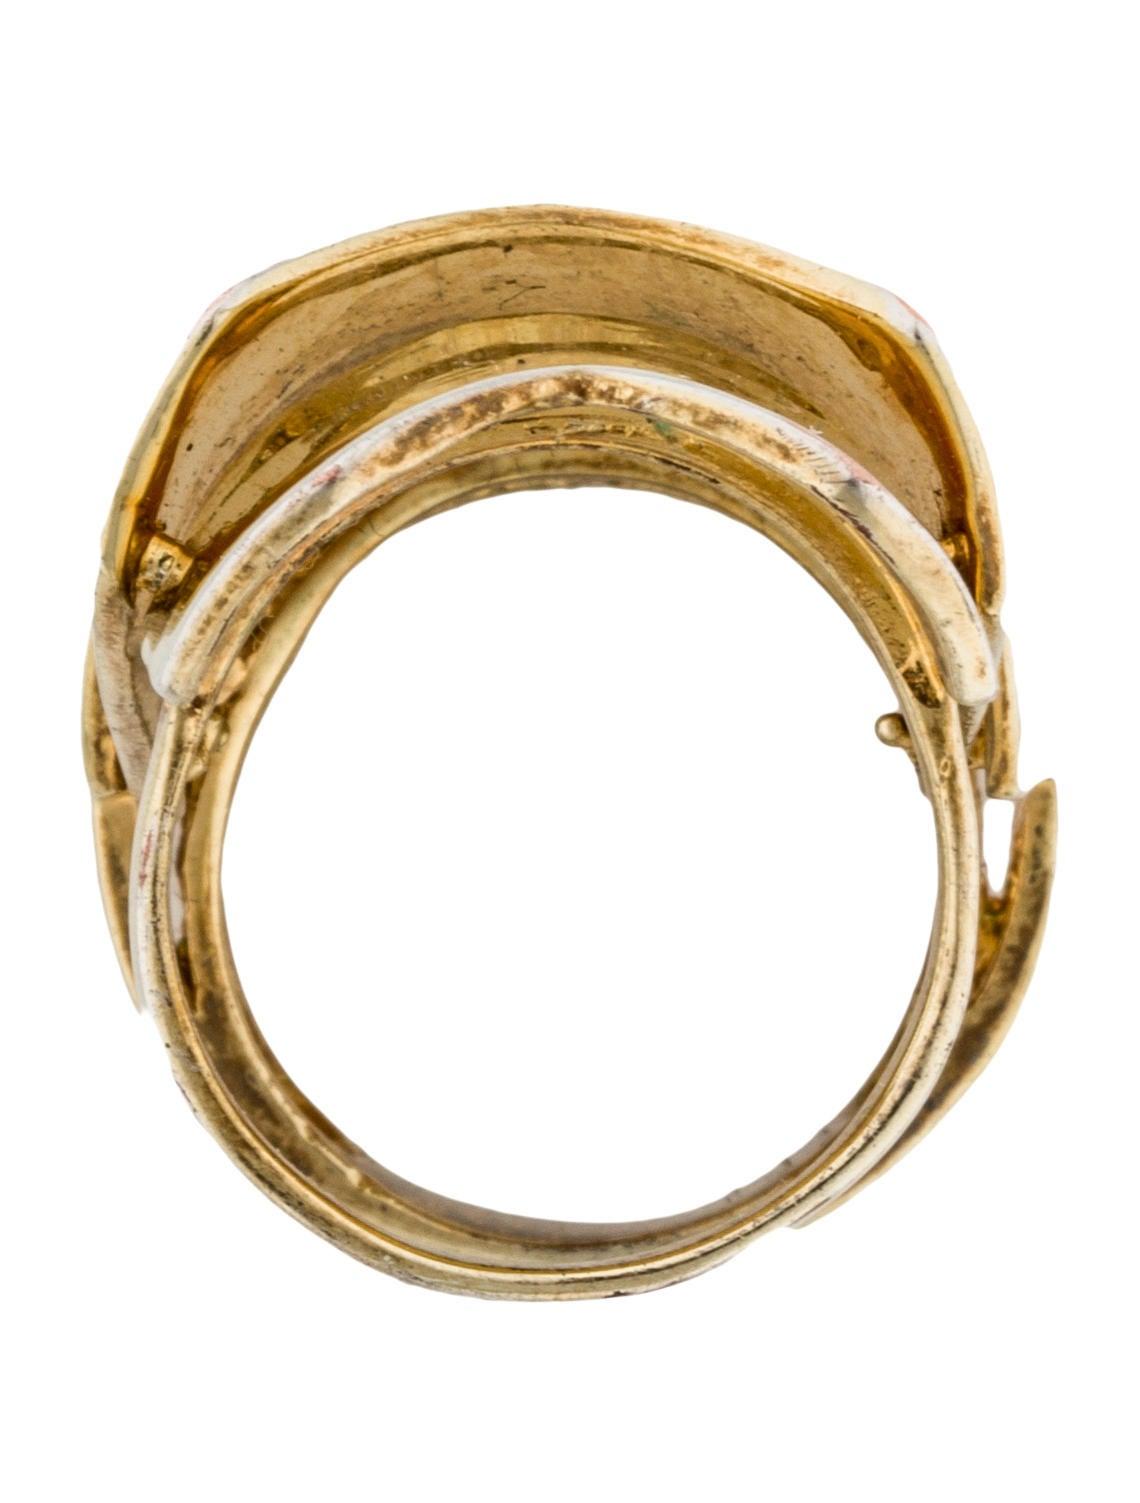 eddie borgo hinge ring rings ebo20982 the realreal